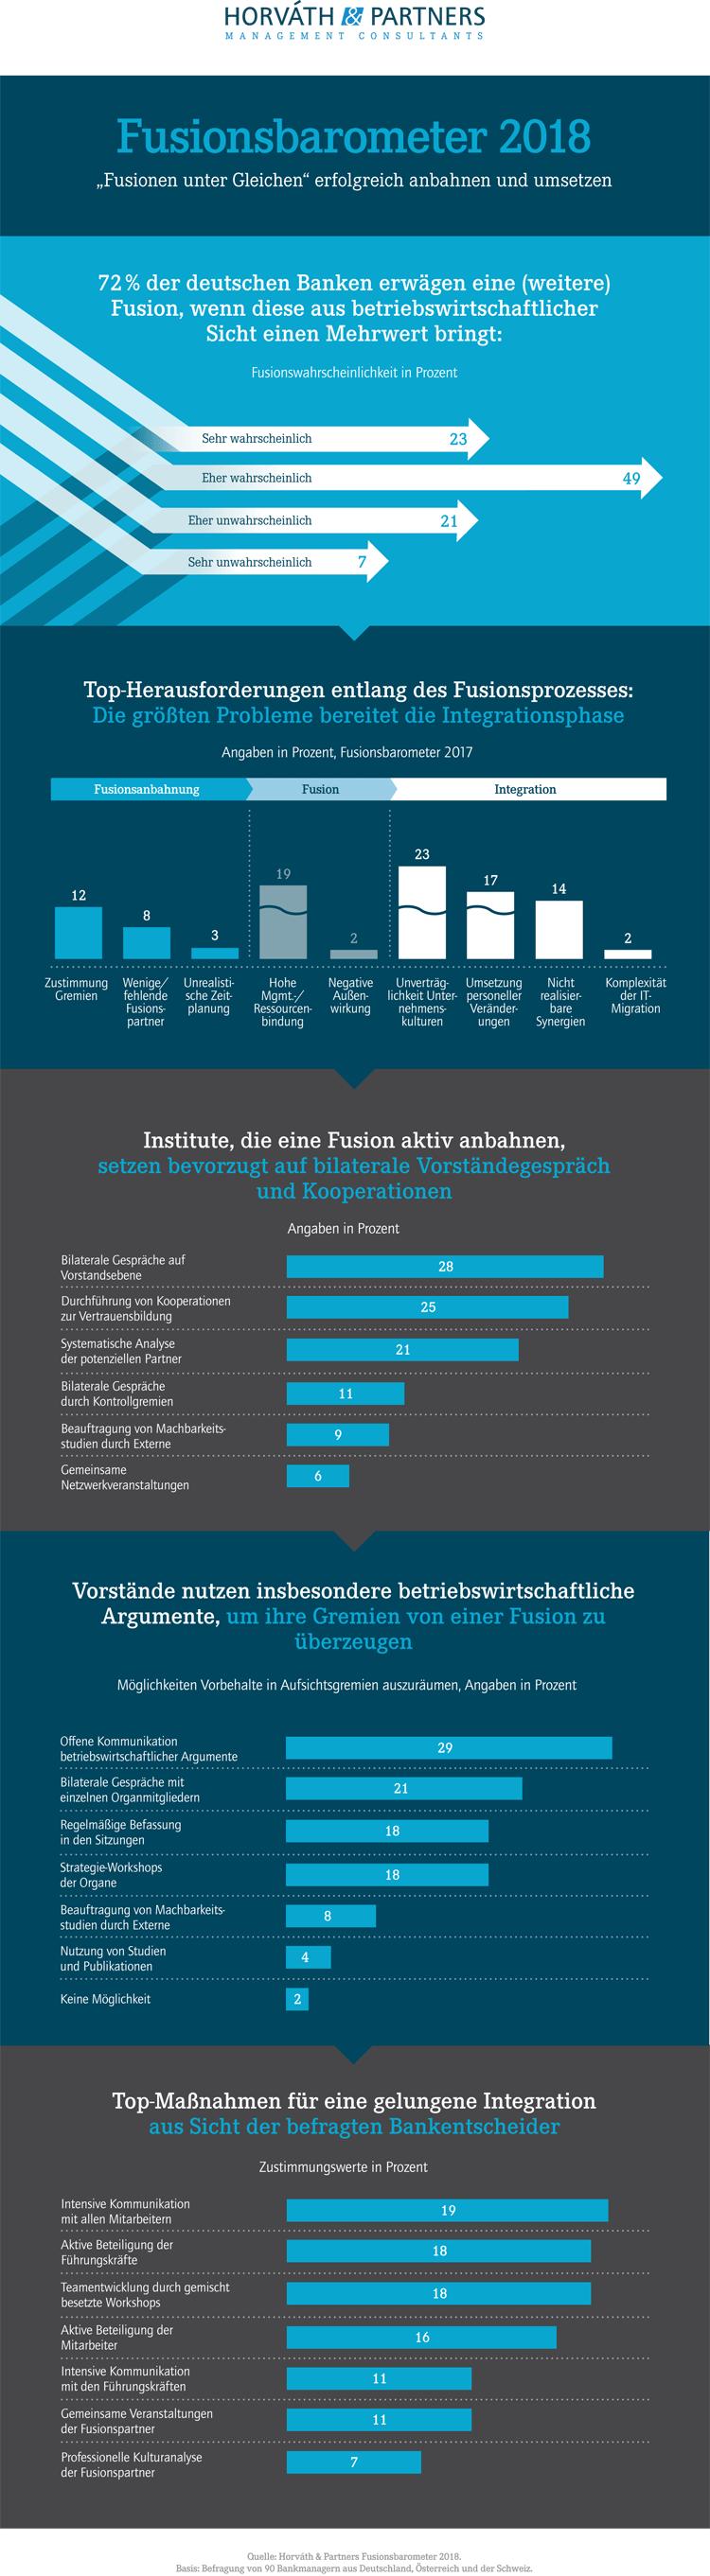 Infografik: Fusionsbarometer 2018